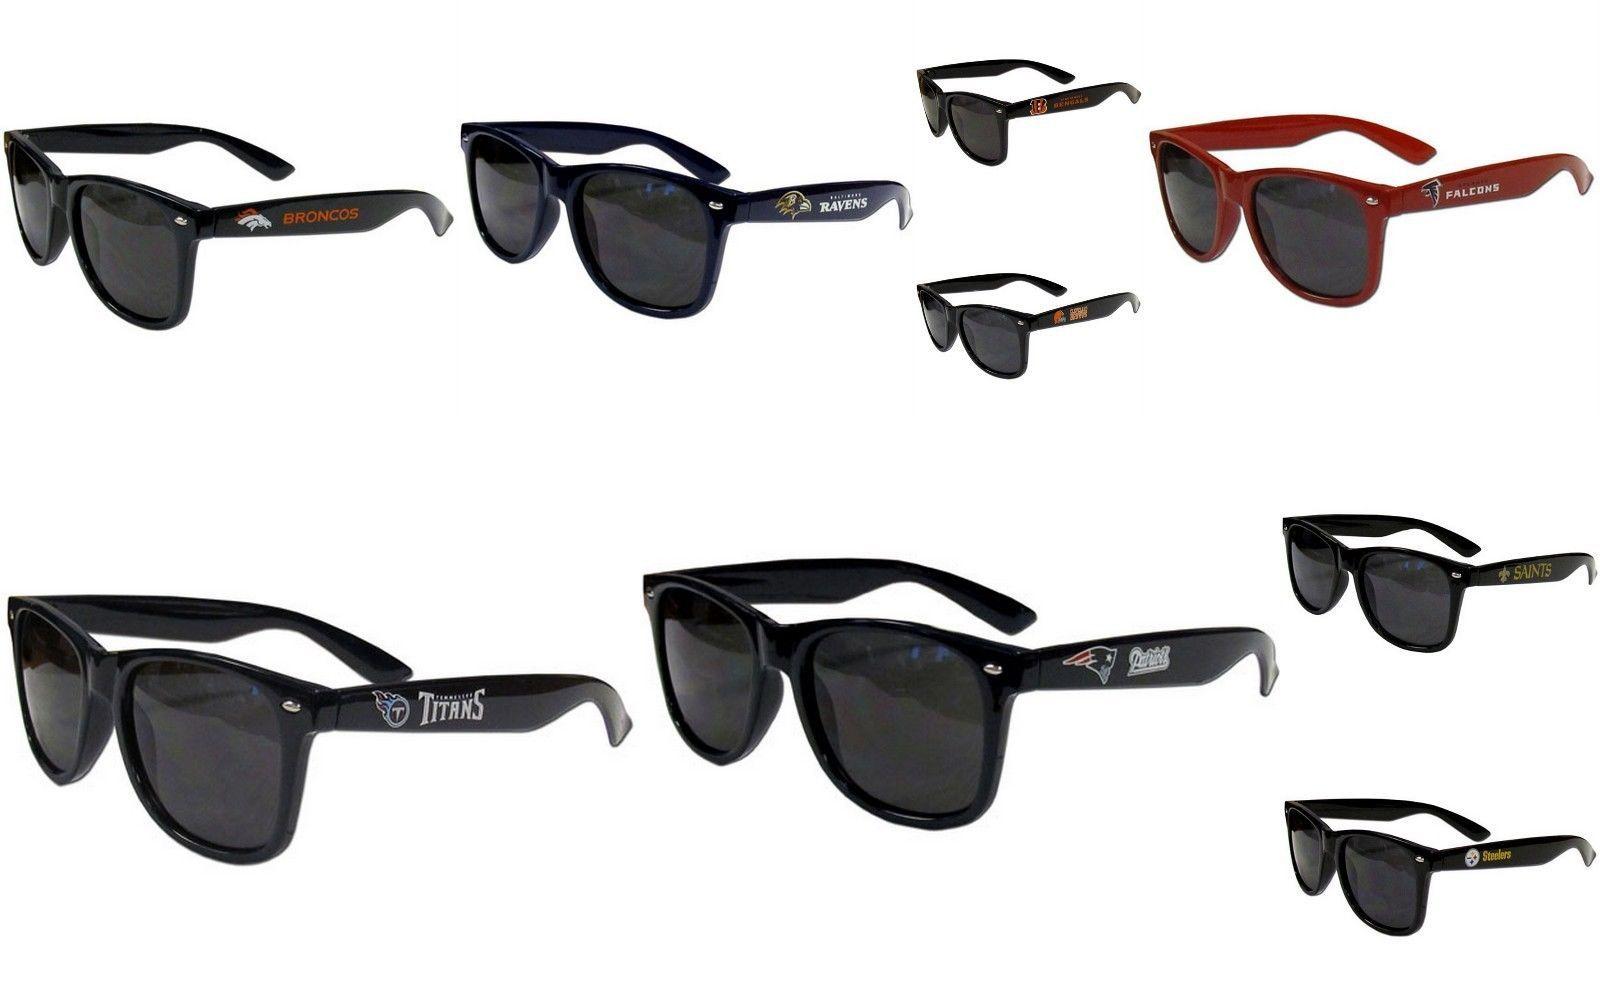 8ccbd621cfe9 Nfl Team Beachfarer Sunglasses - Choose Your Team